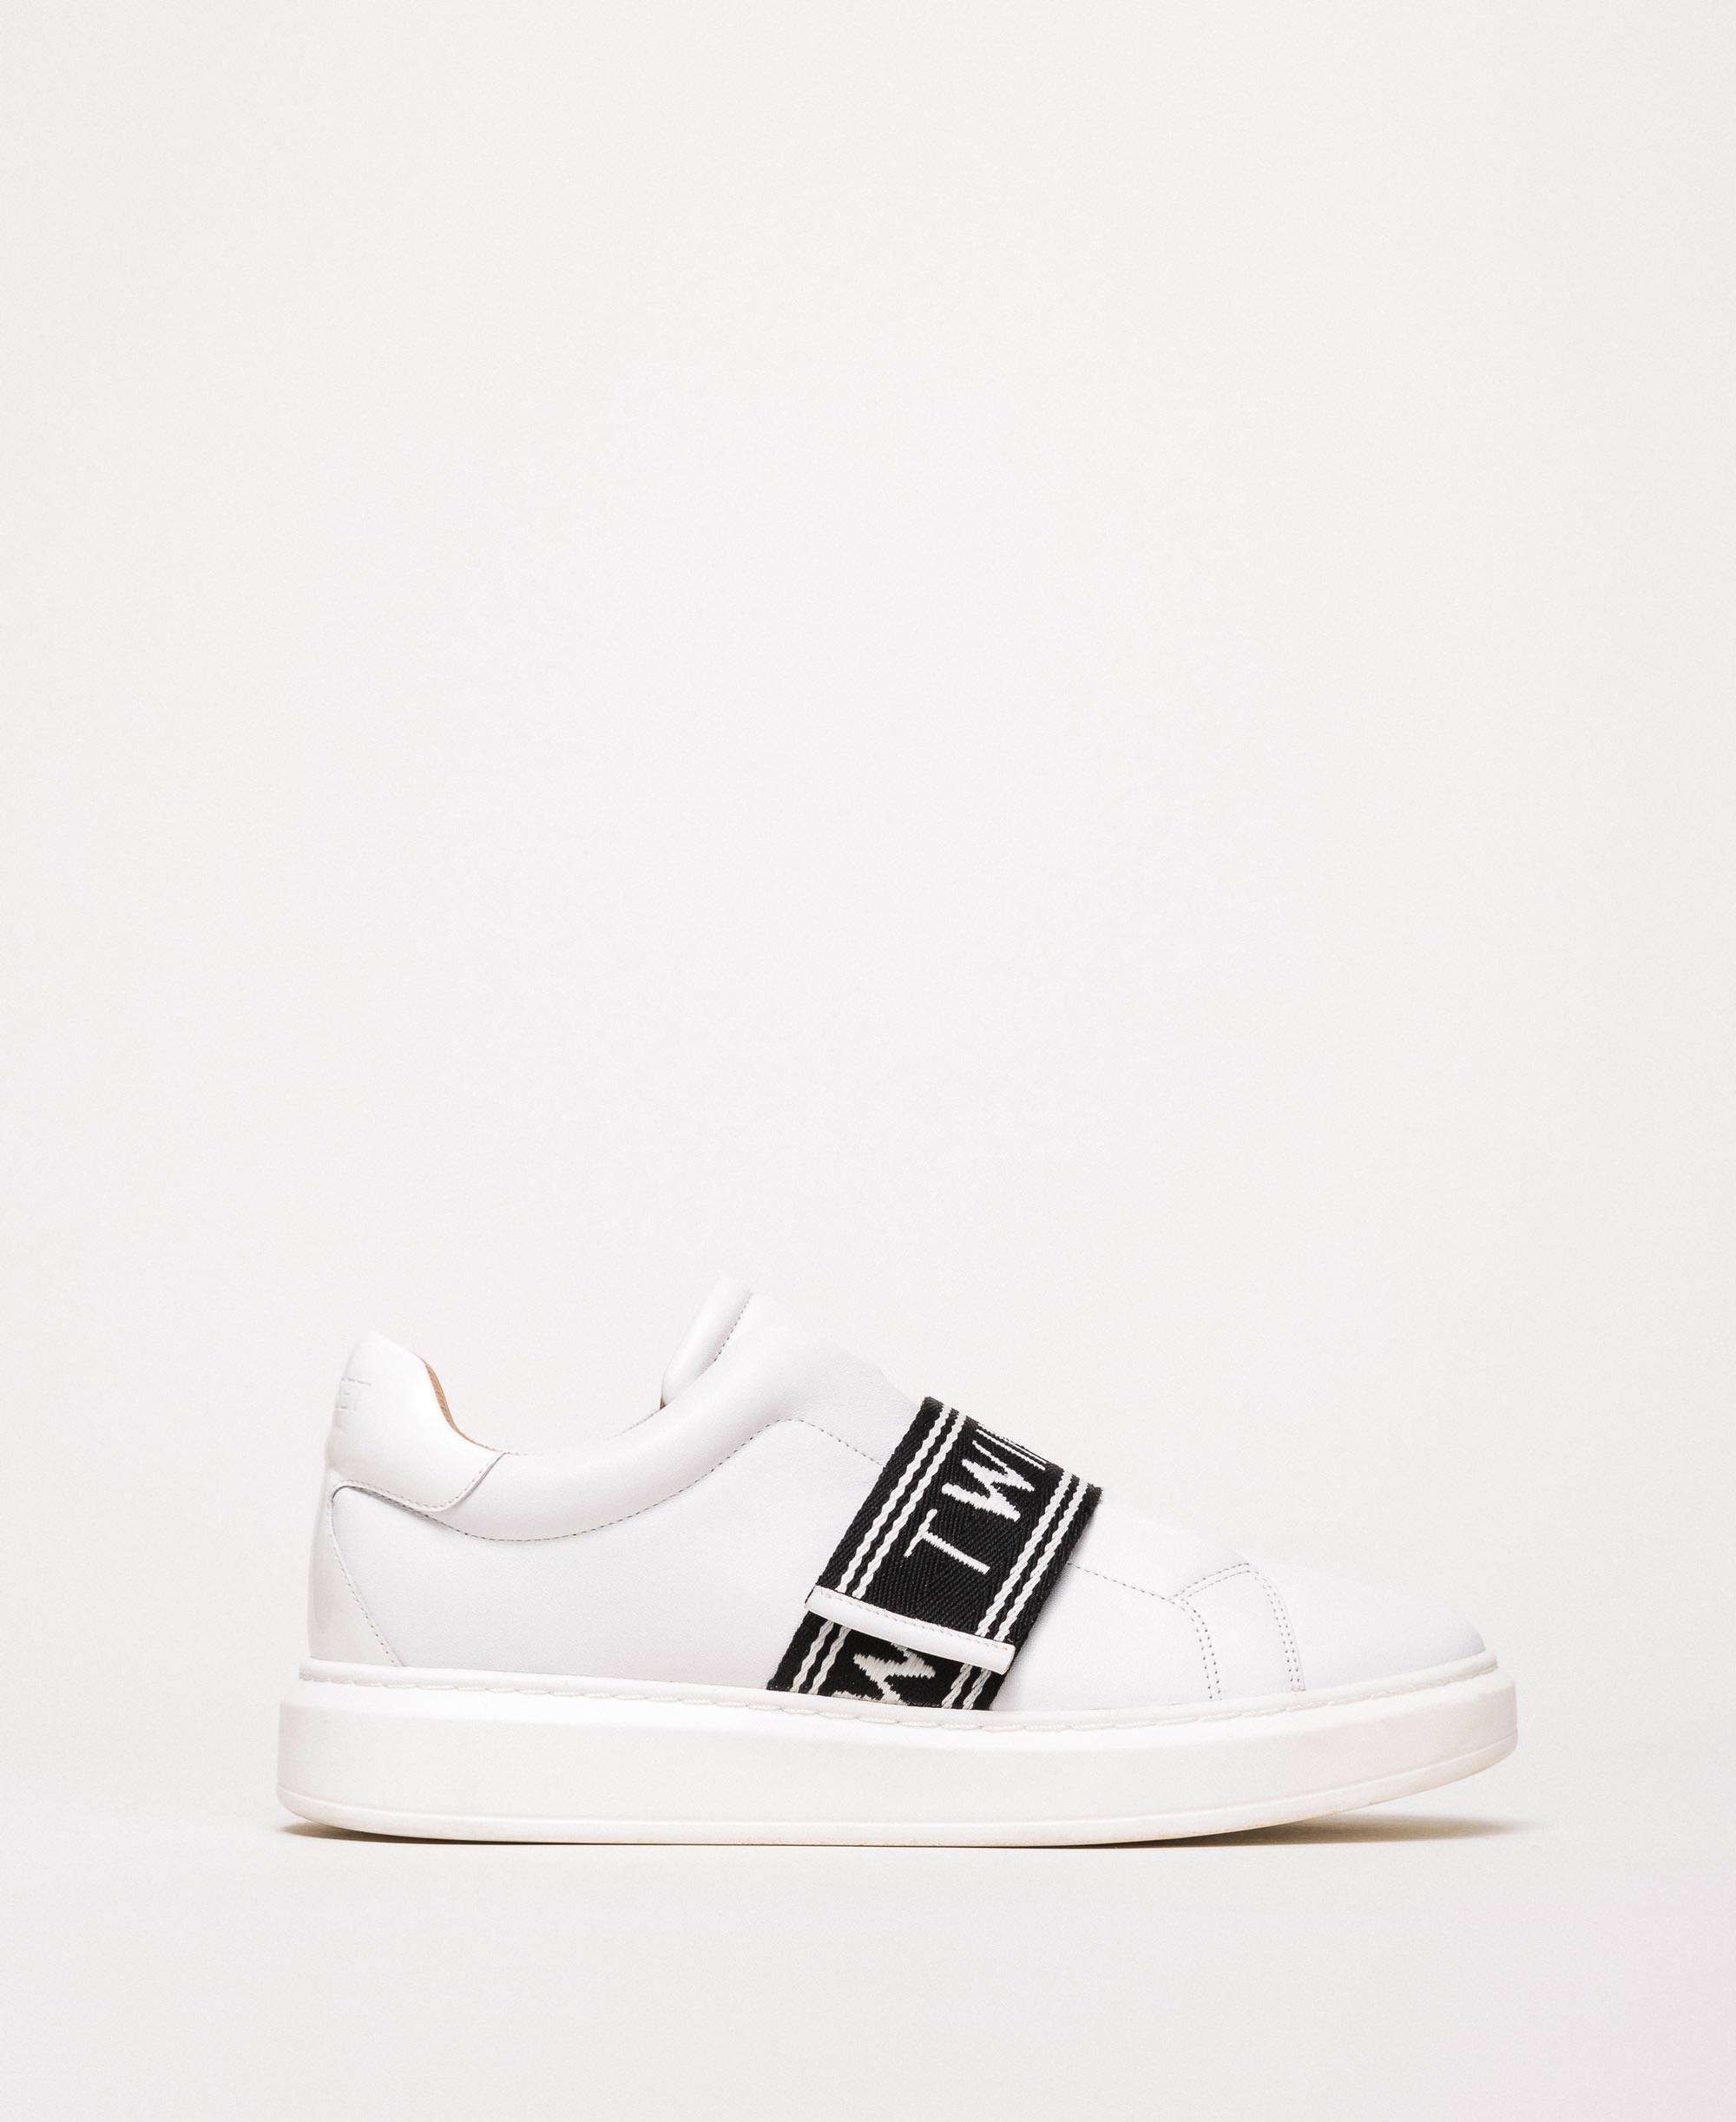 Baskets en cuir avec logo Femme, Blanc | TWINSET Milano